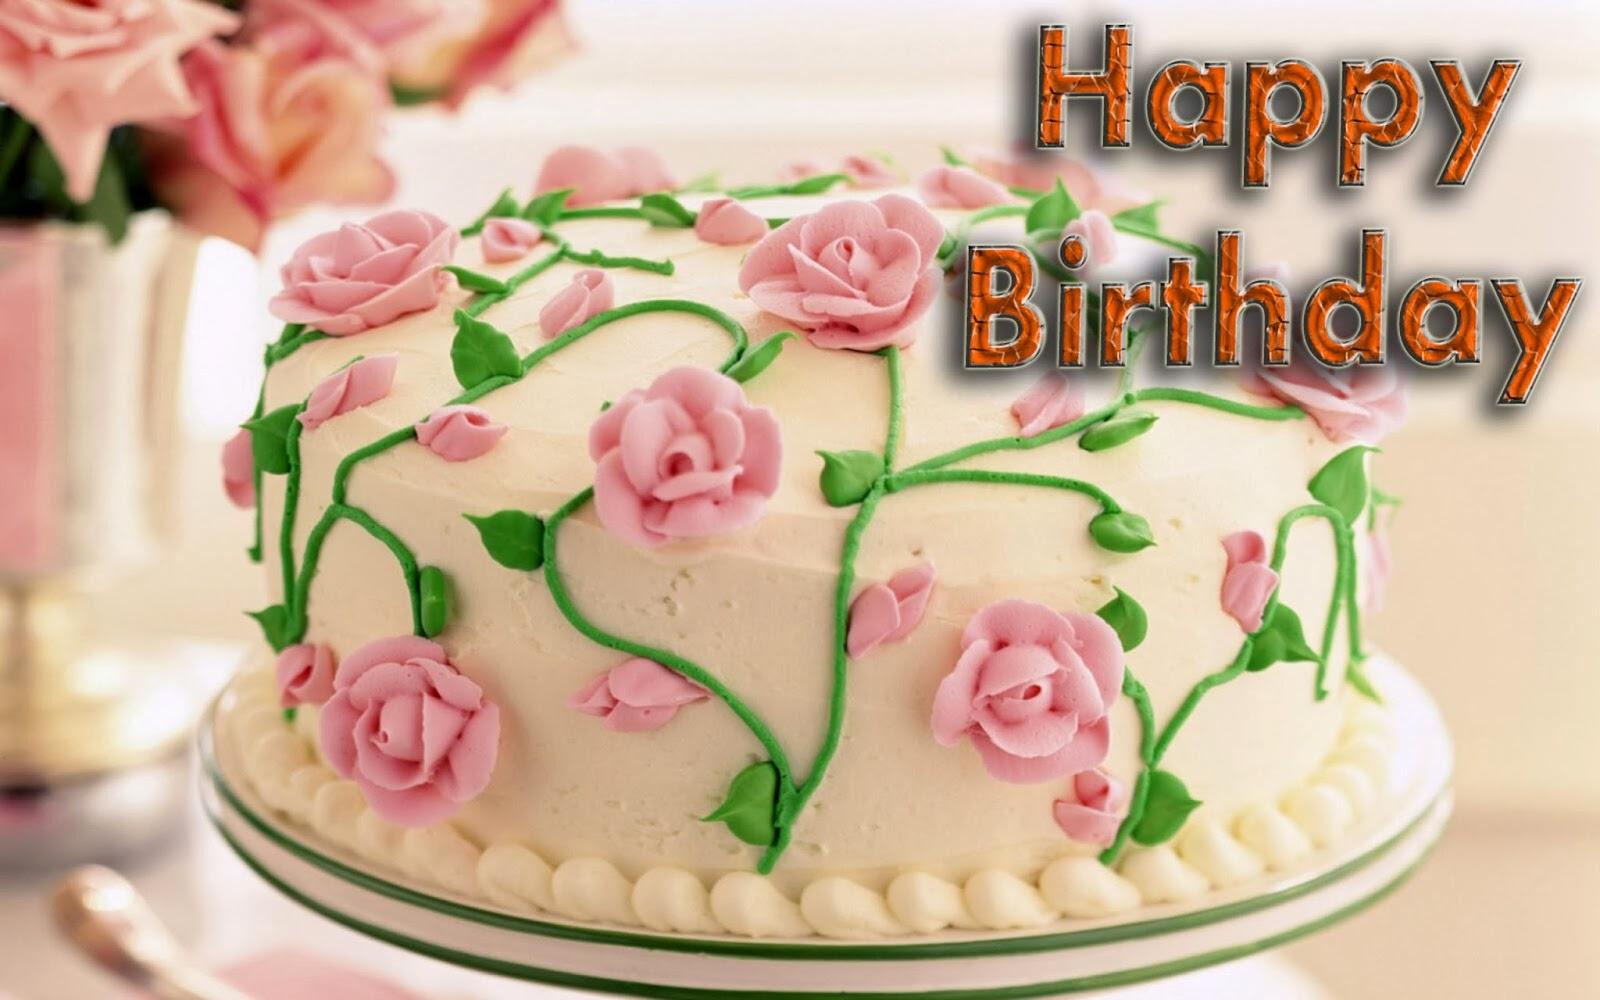 happy-birthday-good-wishes-with-cake